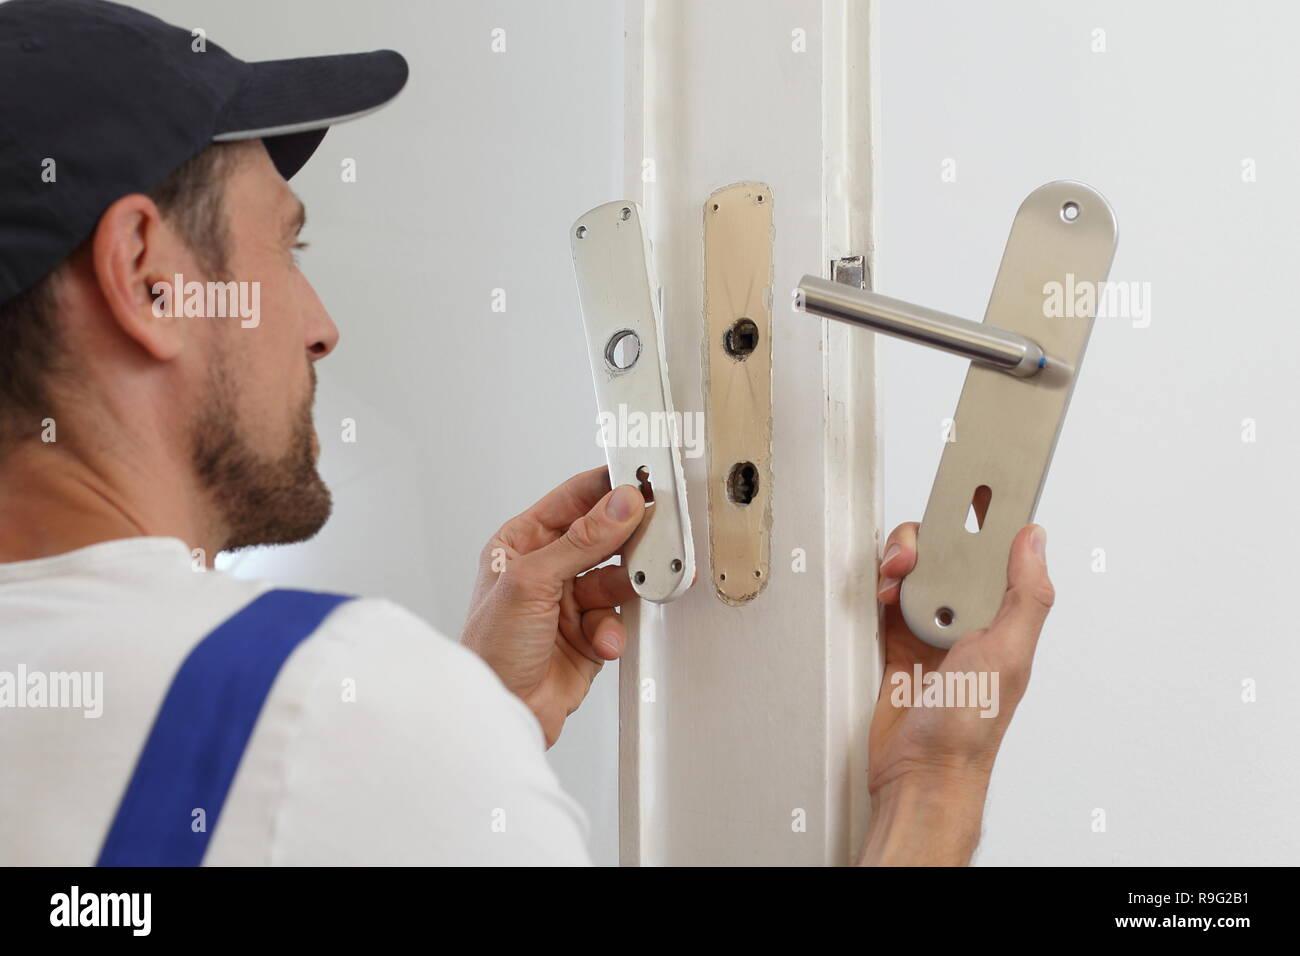 A man Replacing a door handle - Stock Image